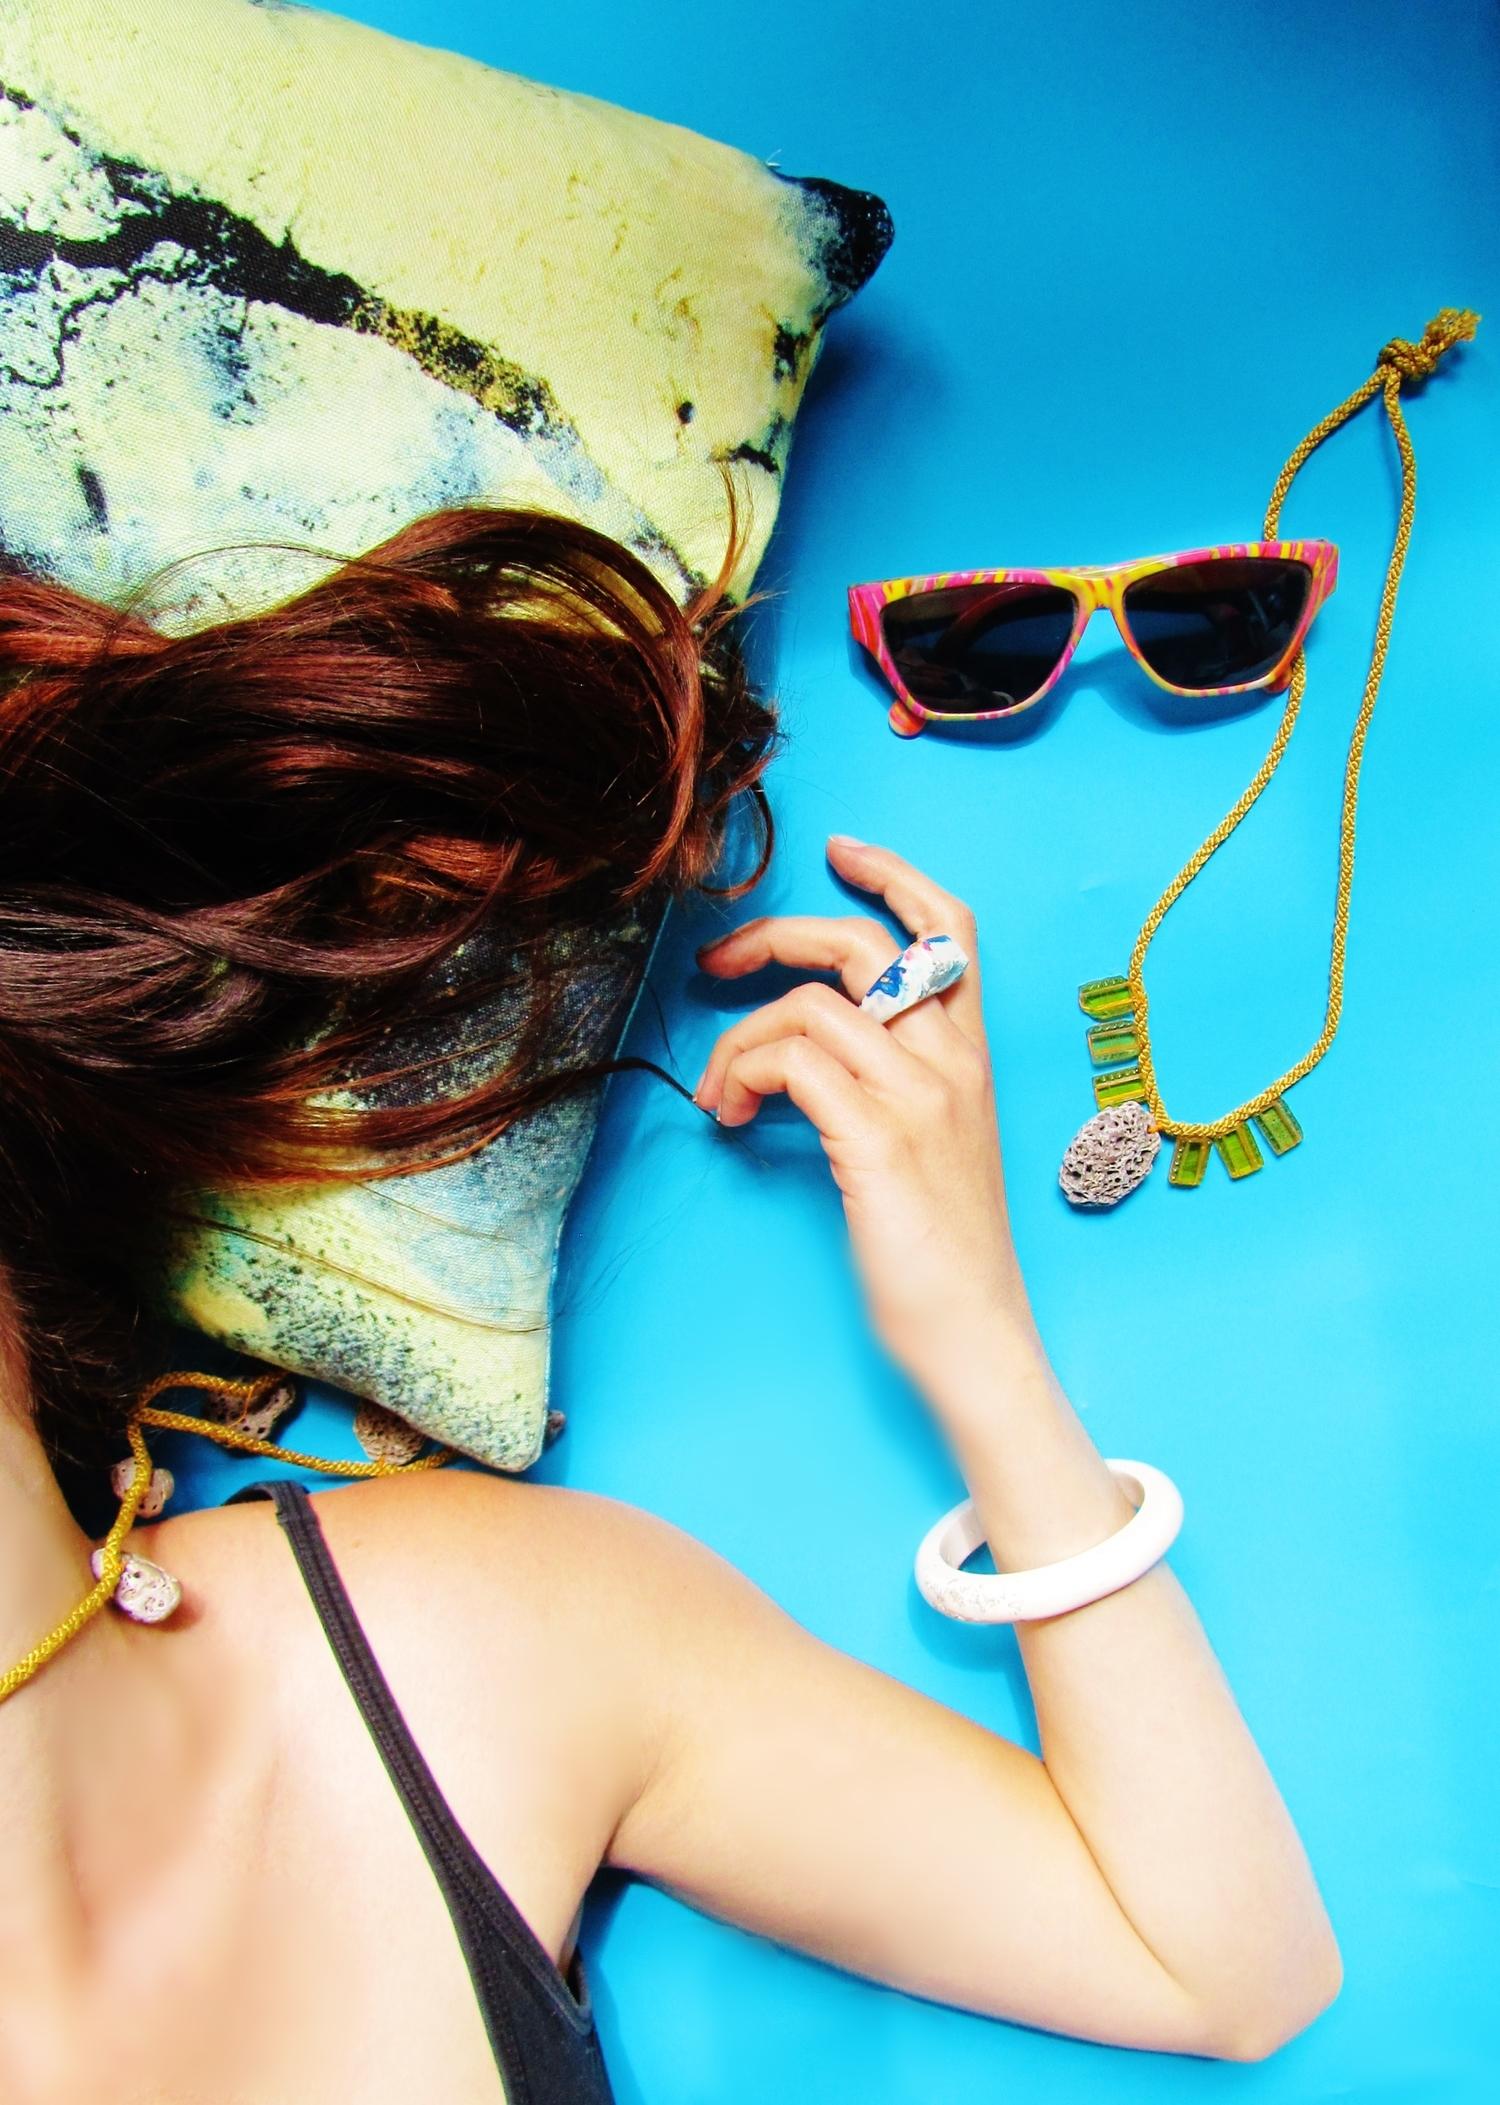 jade mellor blue background still life sunglasses mermaid hair cushion necklaces white bangle ring.JPG